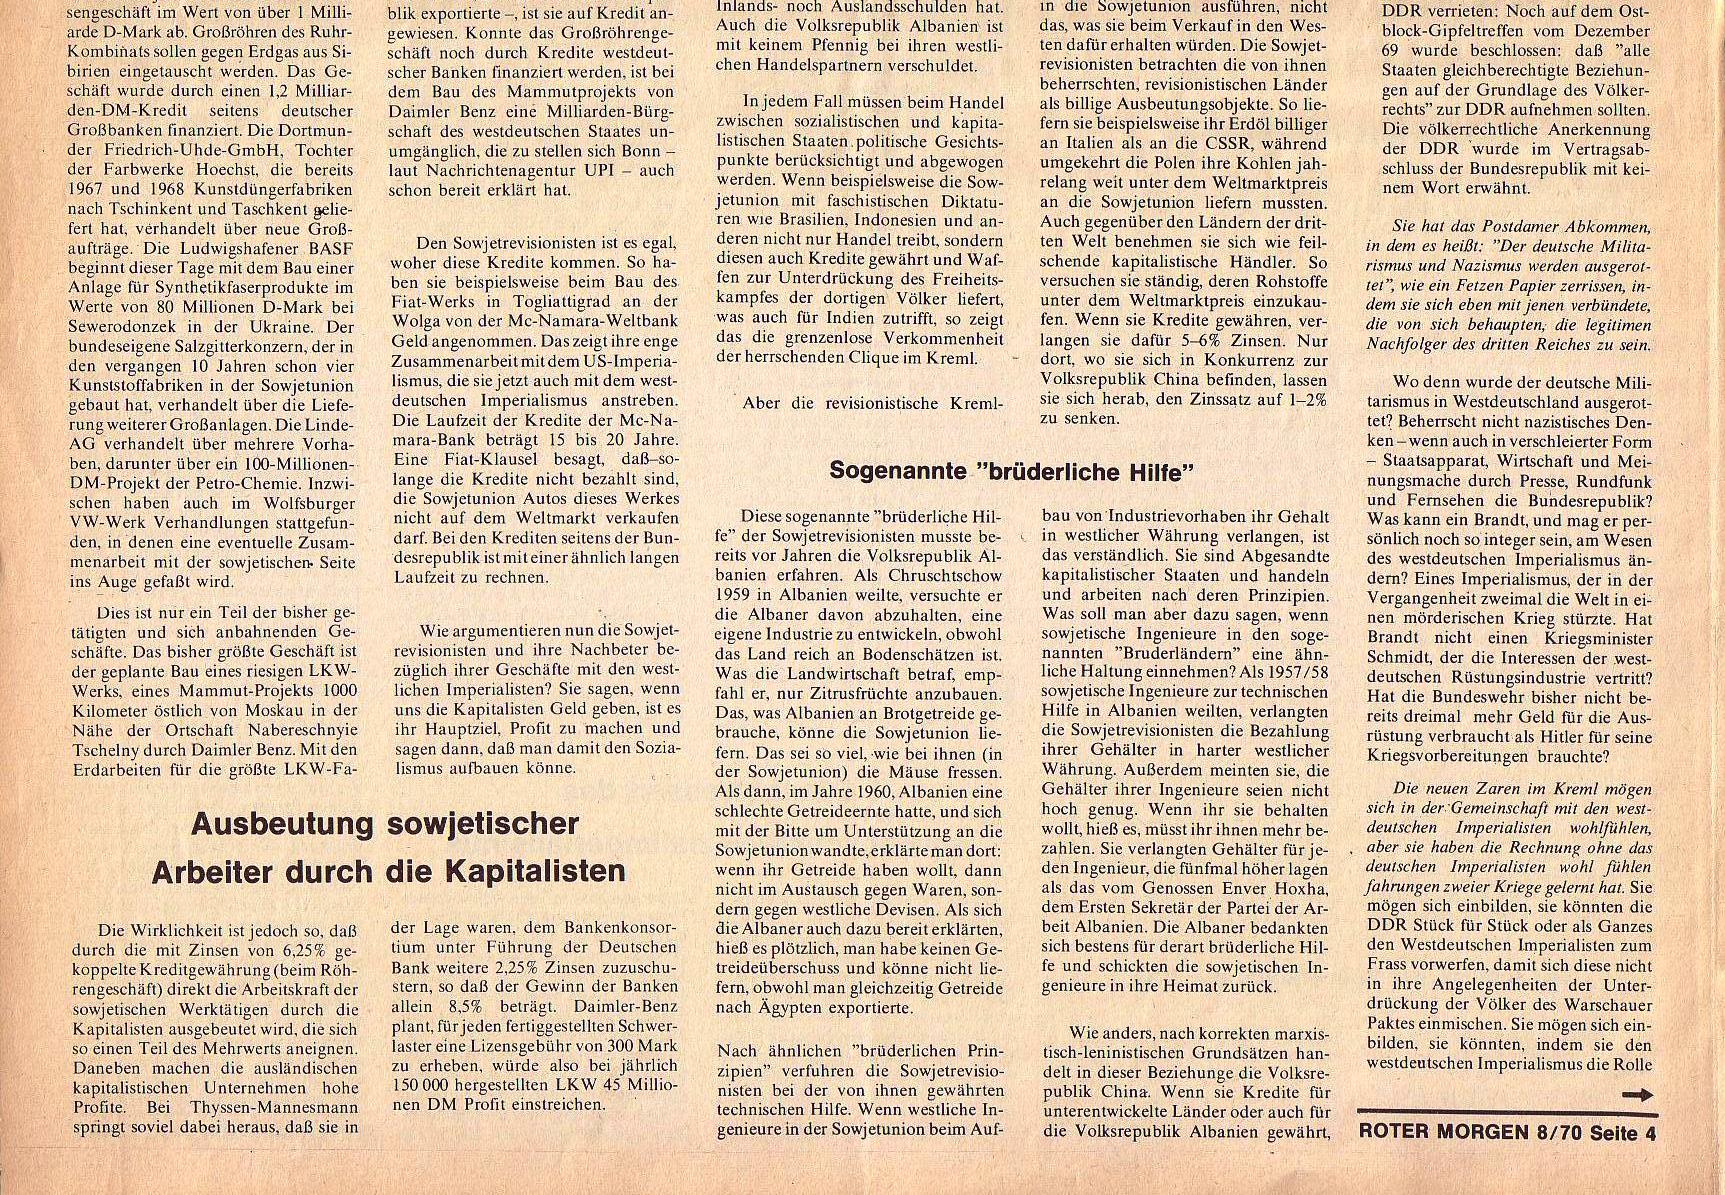 Roter Morgen, 4. Jg., September 1970, Nr. 8, Seite 4b